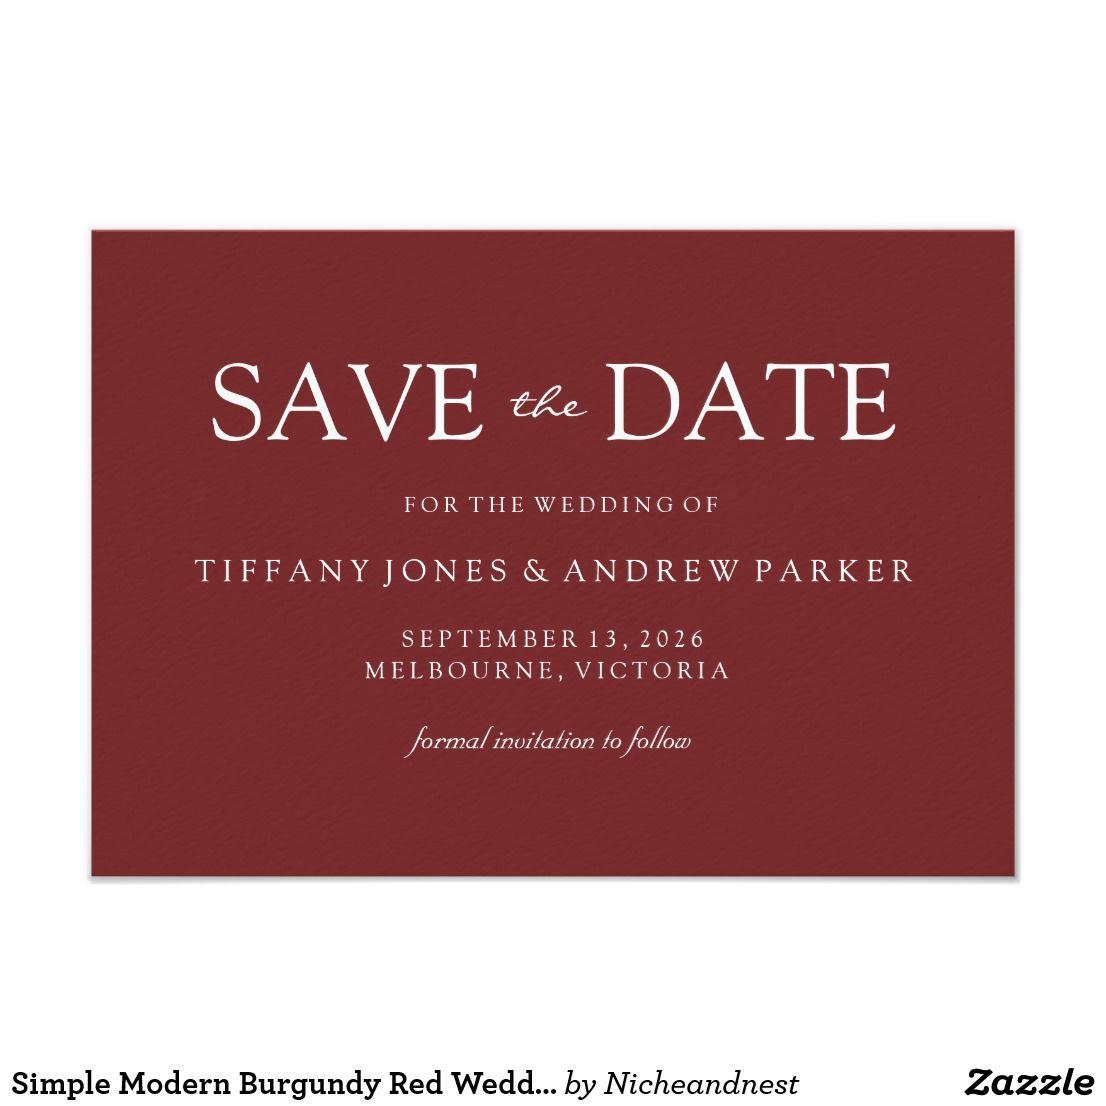 Simple Modern Burgundy Red Wedding Save the date | November 2nd ...